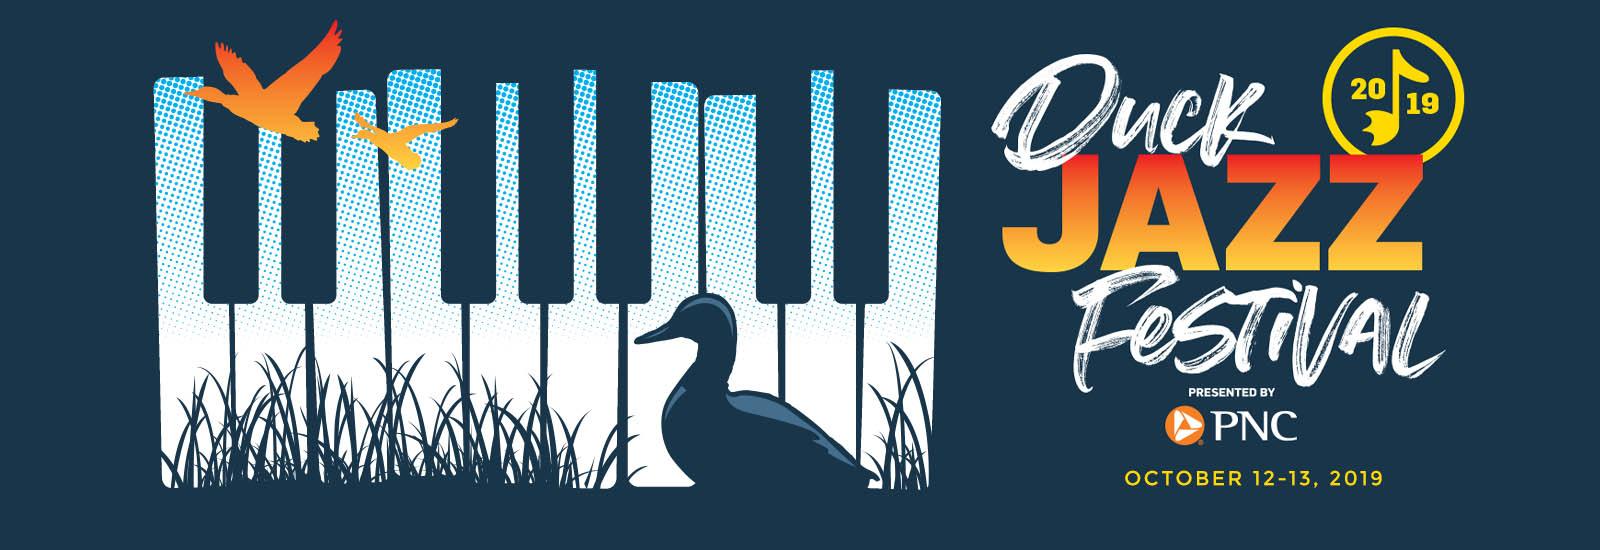 Duck Jazz Festival Banner